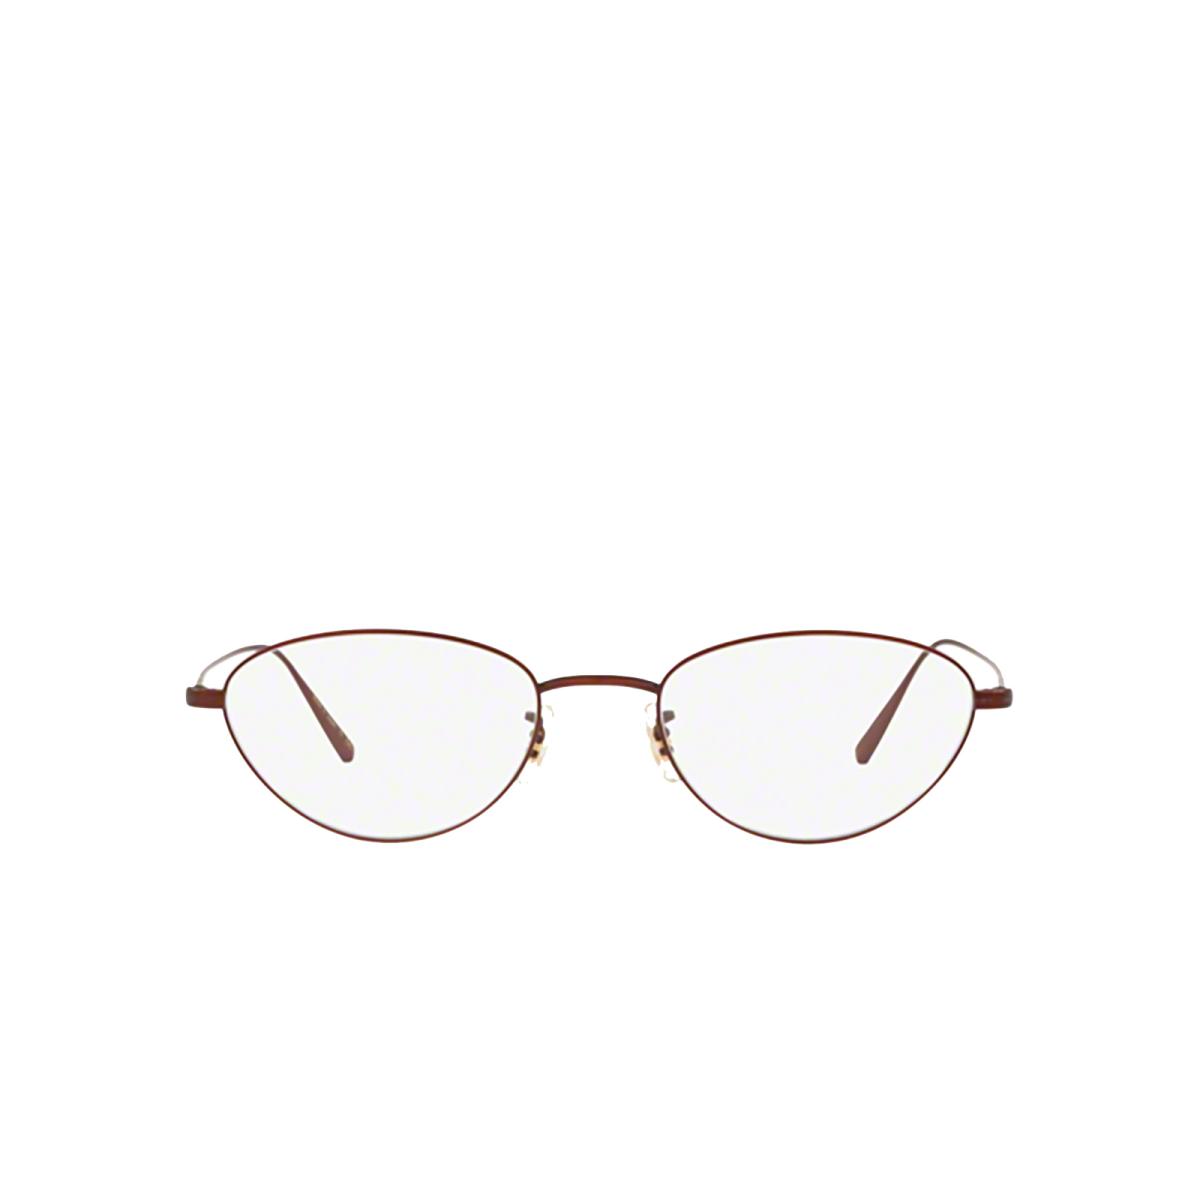 Oliver Peoples® Oval Eyeglasses: Jozette OV1247T color 5294 - front view.